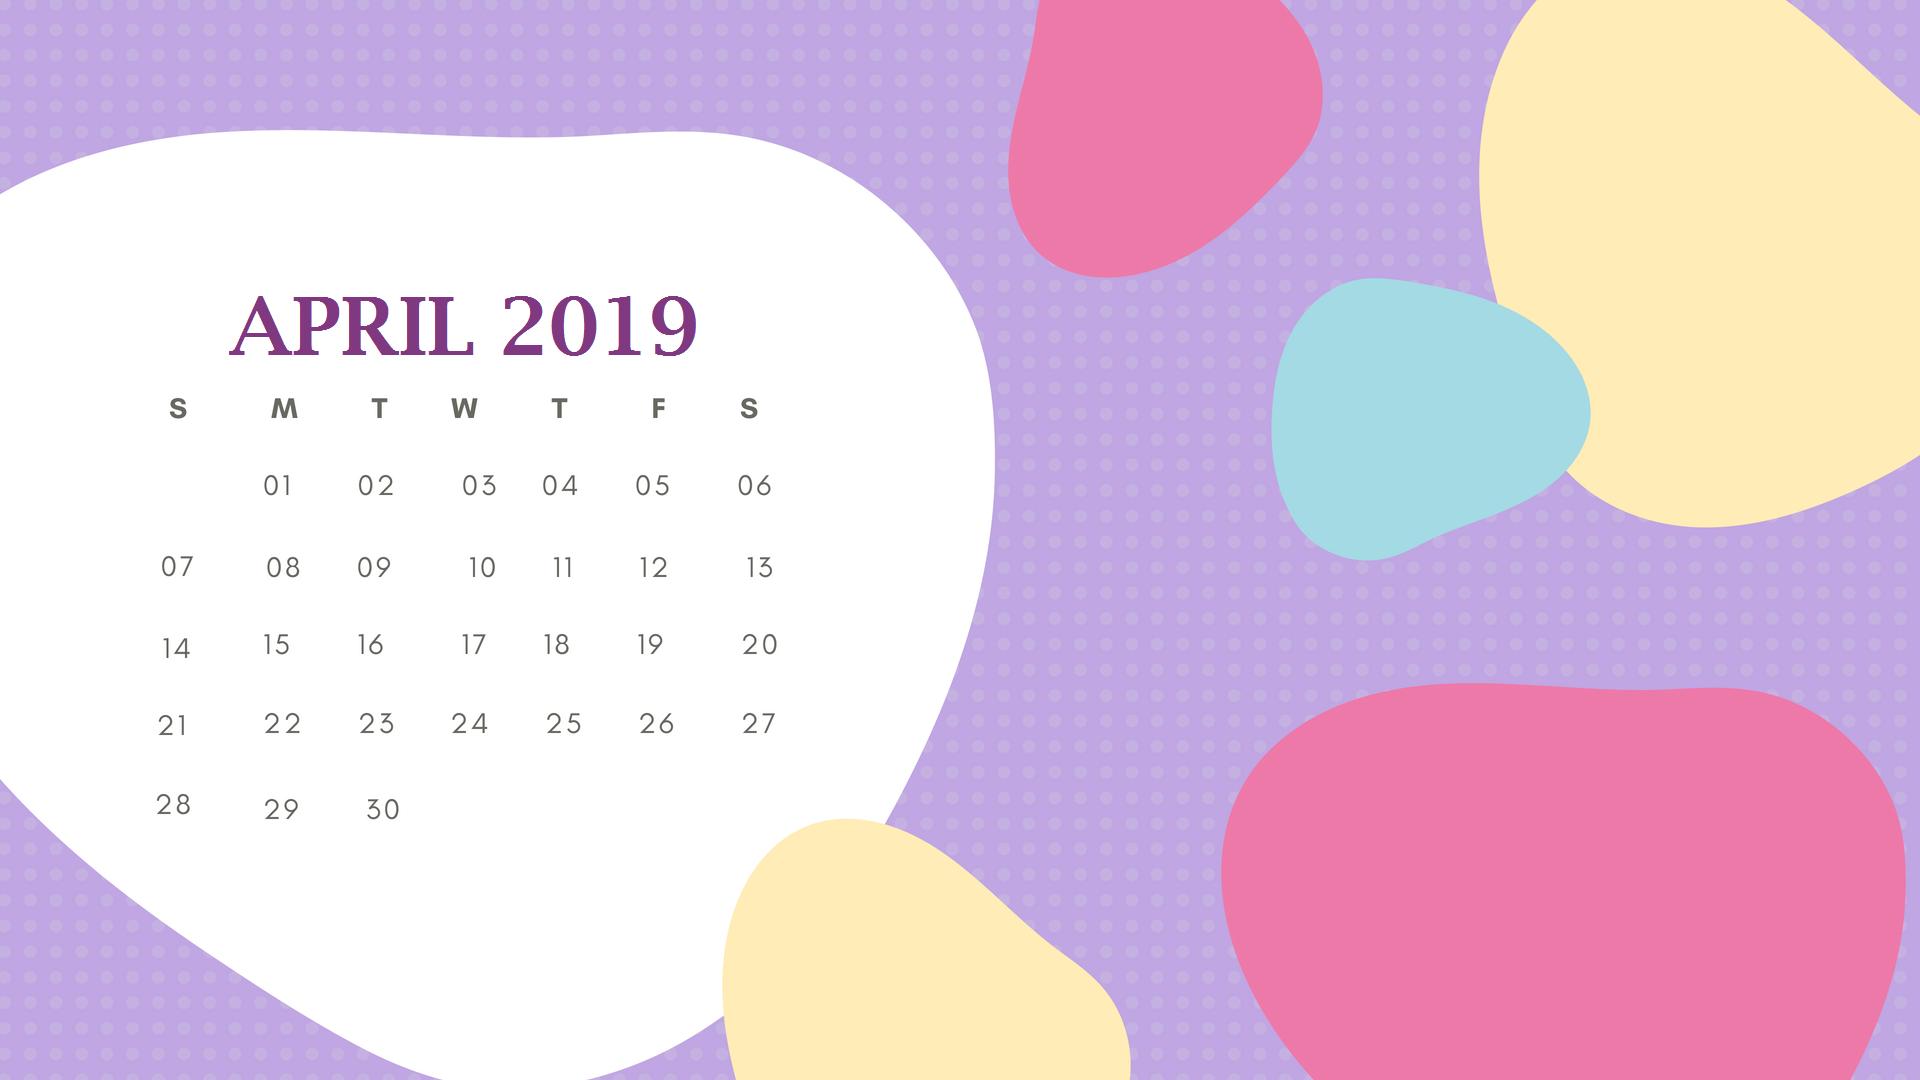 Beautiful April 2019 Calendar Template